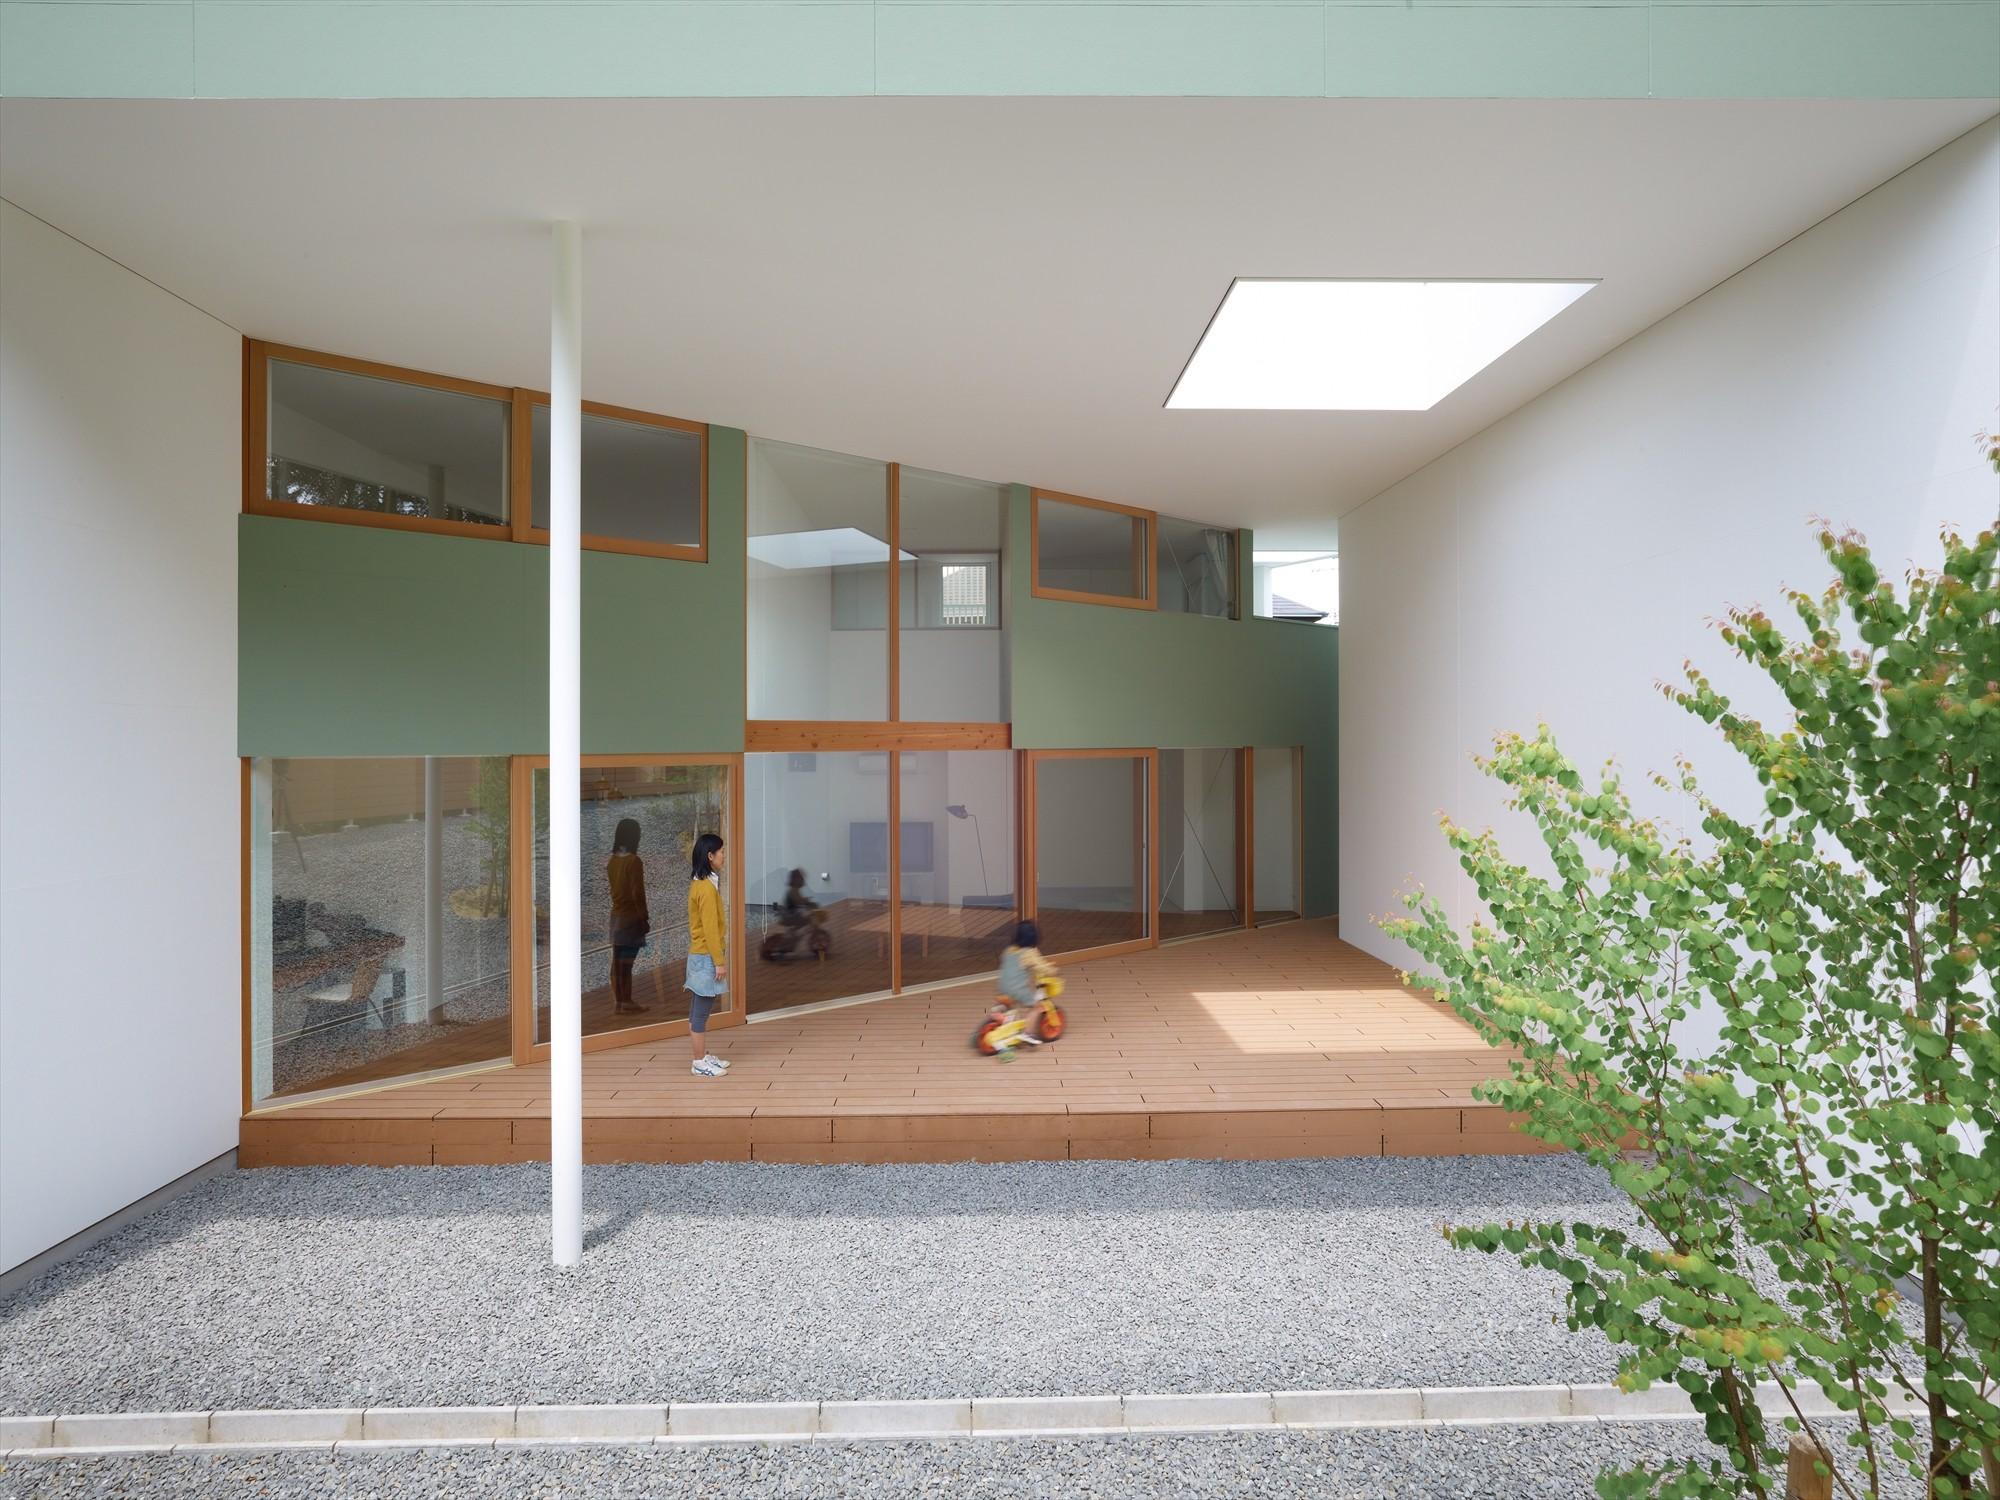 House in Kawachinagano / Fujiwarramuro Architects, © Toshiyuki Yano